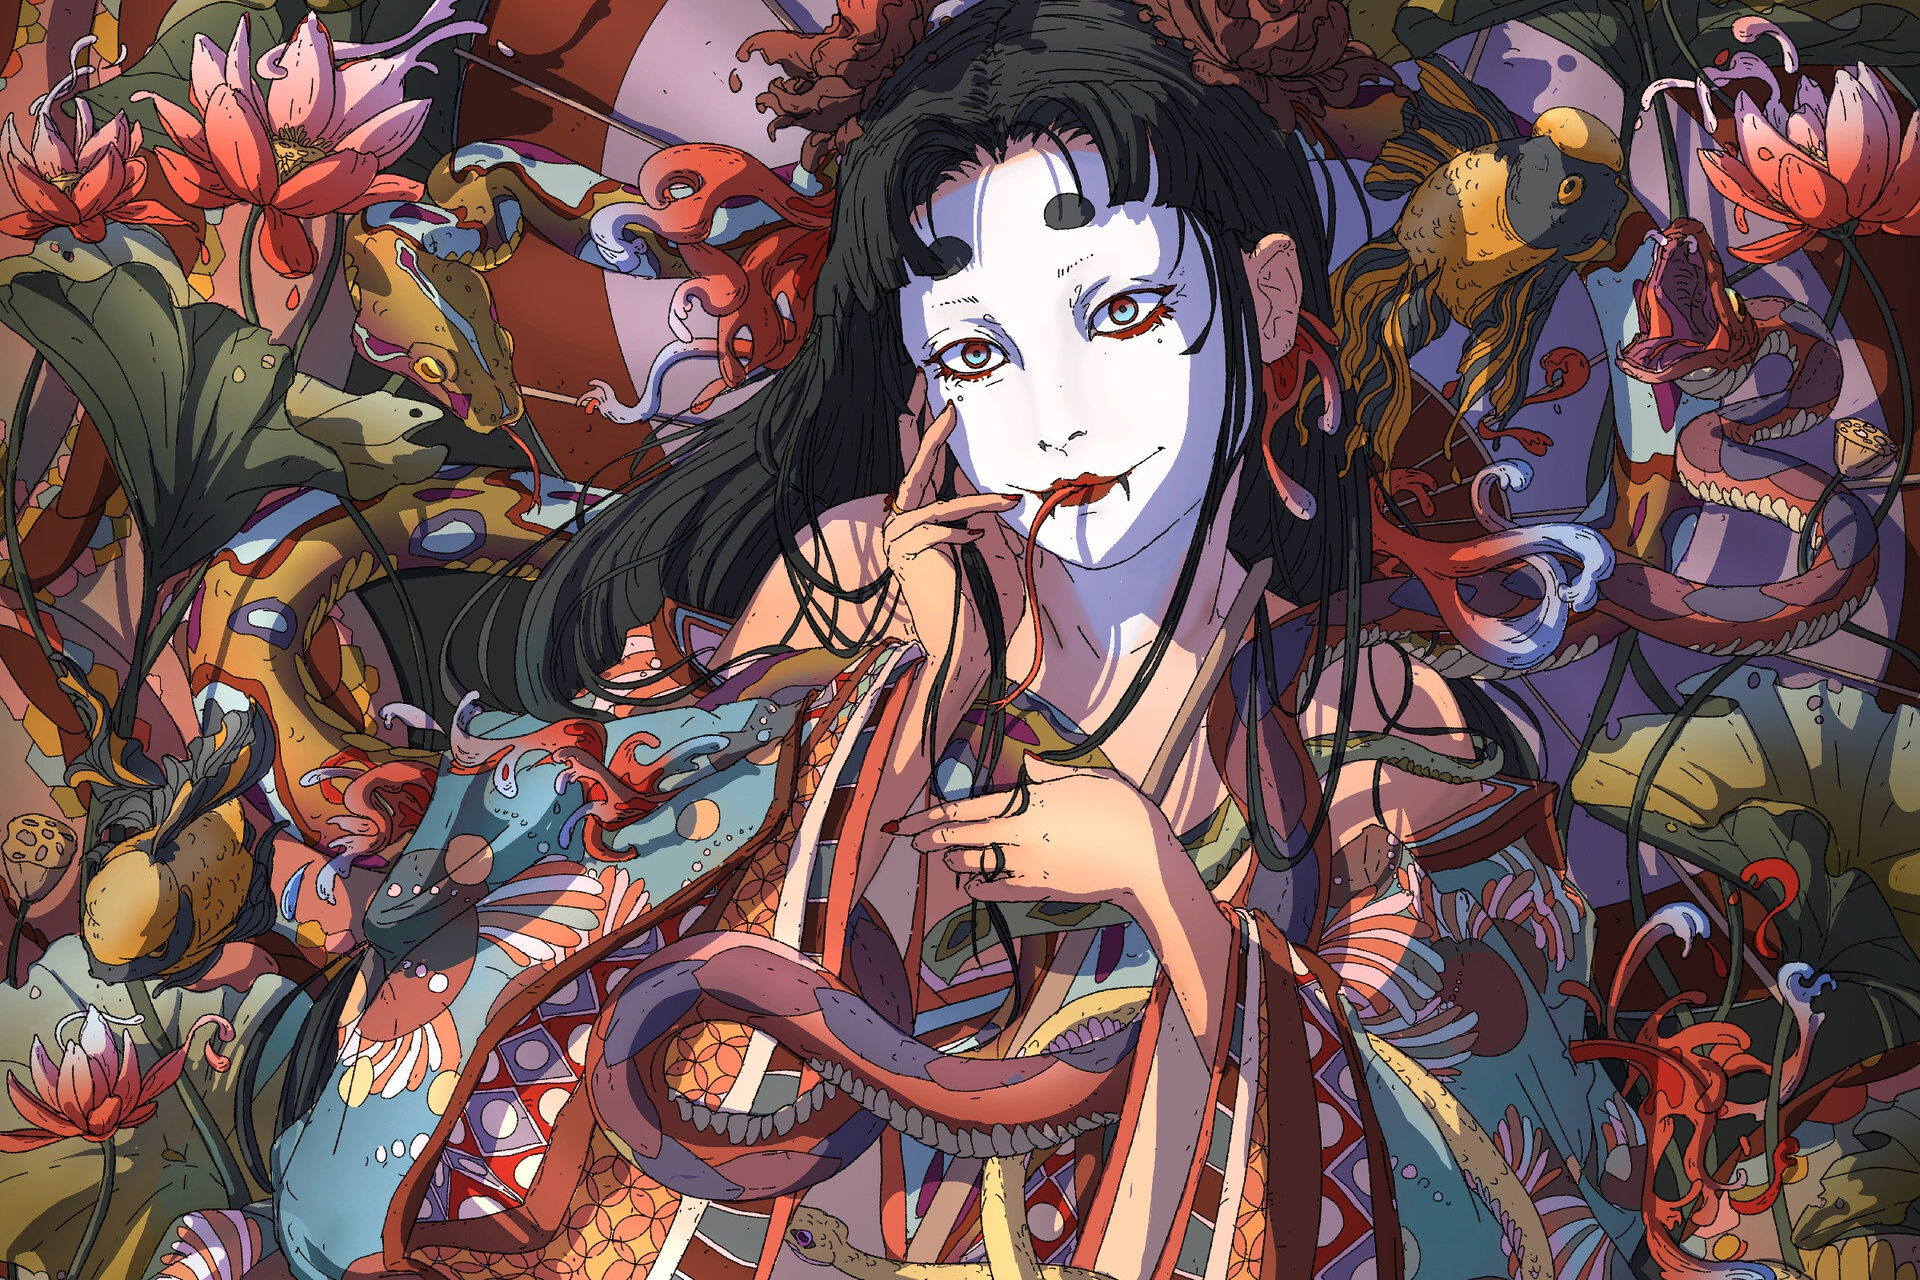 General 1920x1280 artwork women Asian fantasy girl fantasy art Anandah Janaé